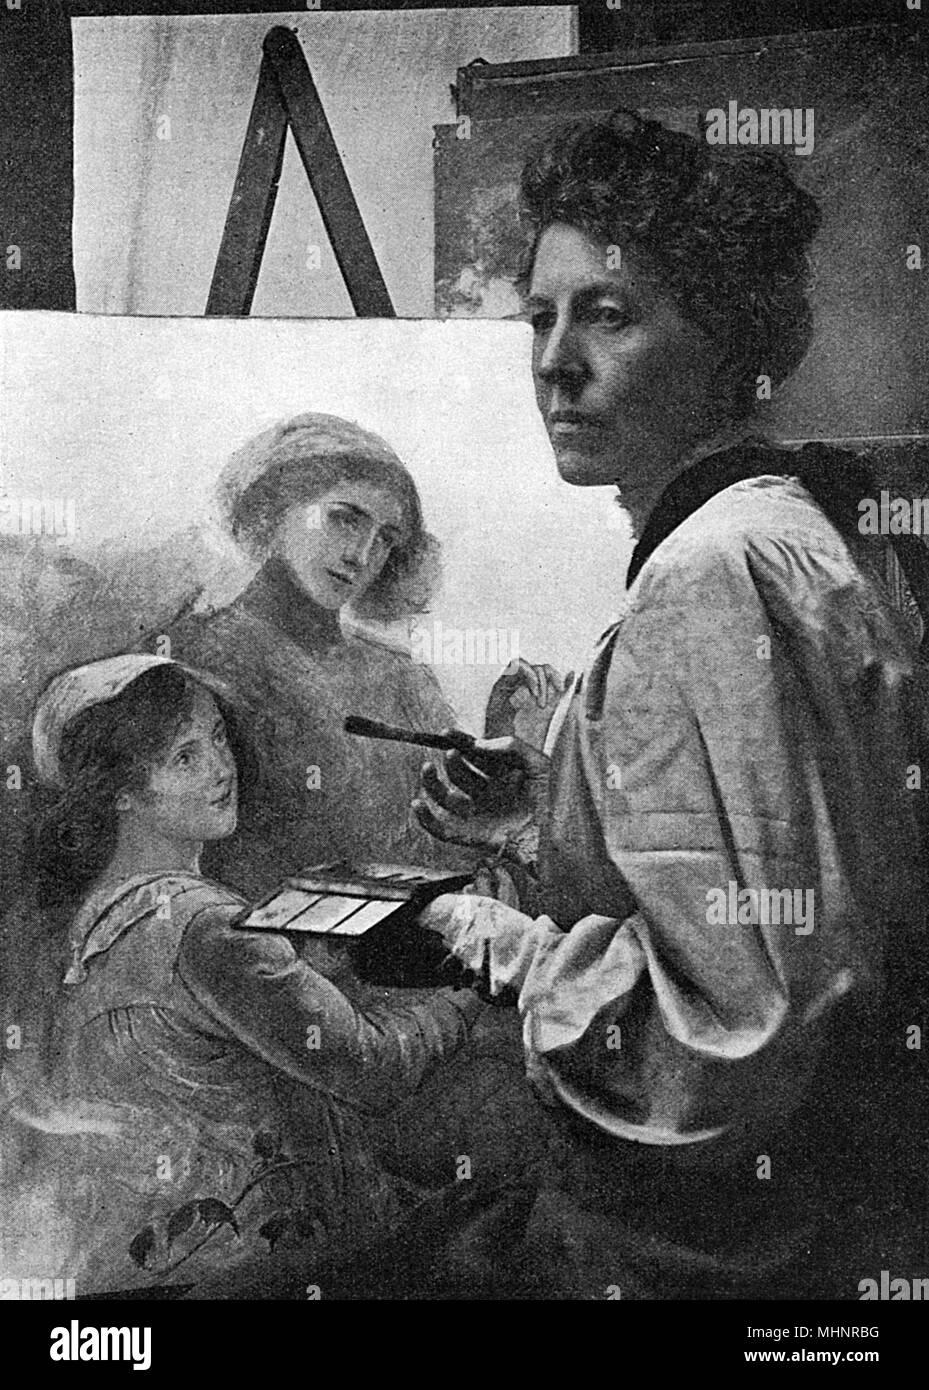 How to Date Old Photos - Daguerreotype Cabinet Card Tintype - Geneal